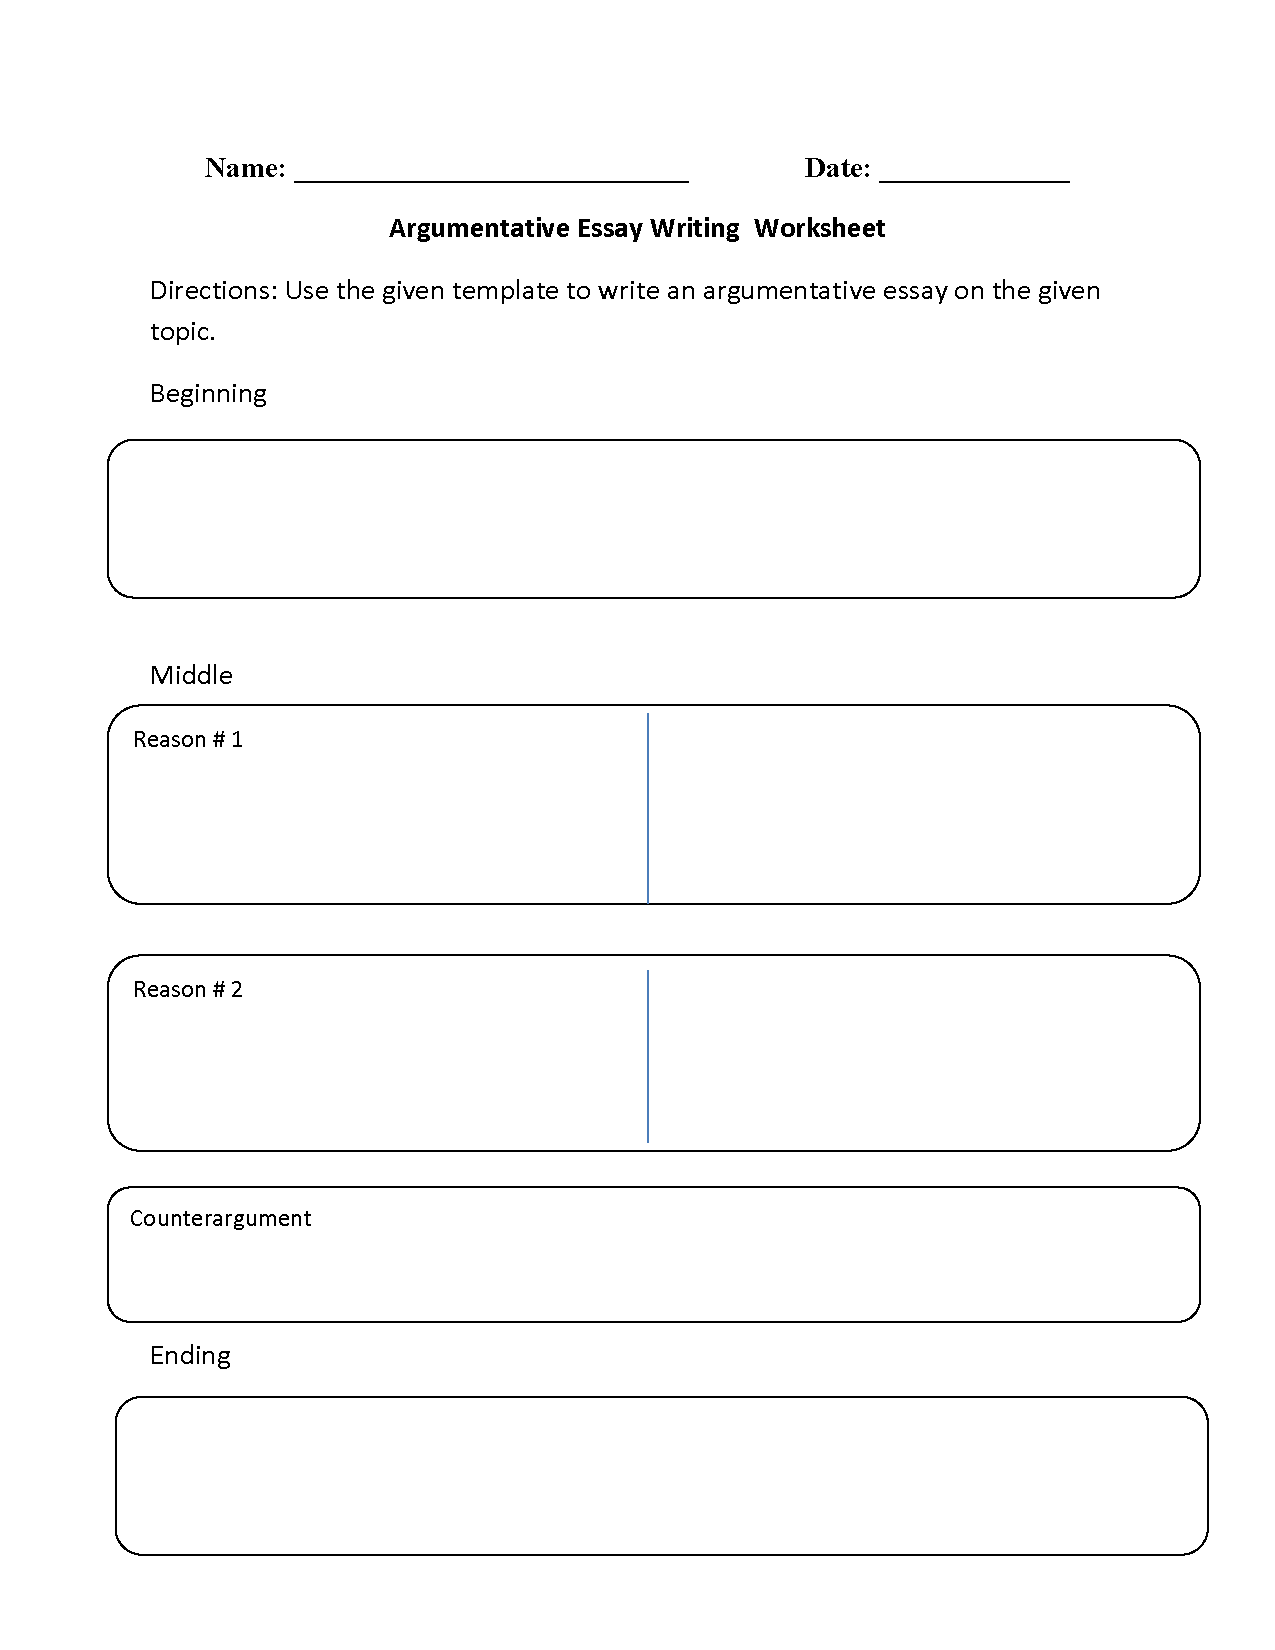 Argumentative Essay Writing Worksheet Outline Argument Against Capital Punishment Pro For